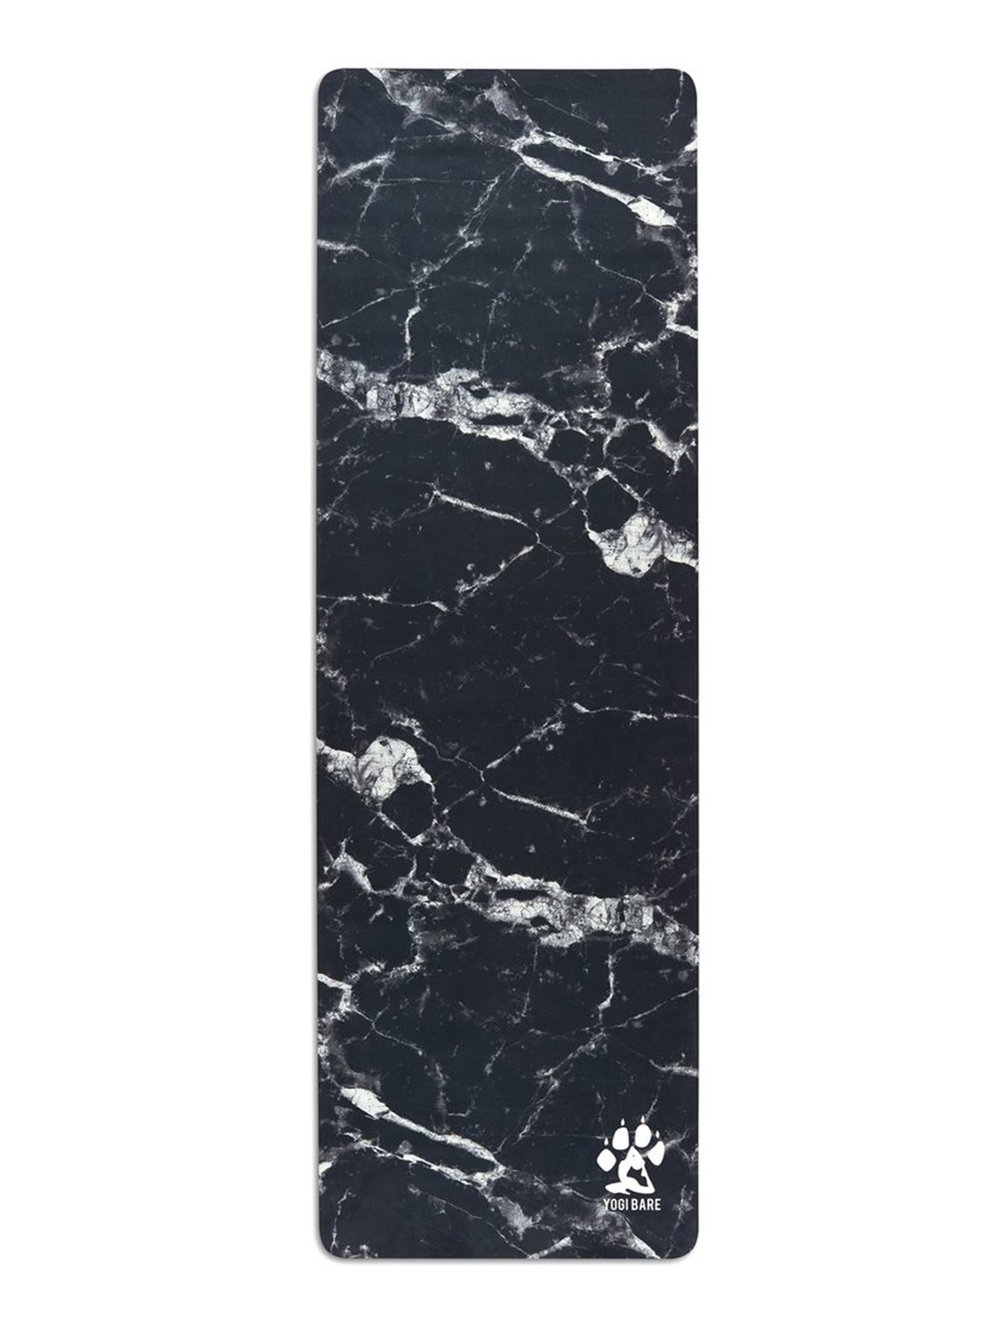 Marble-Yoga-mat.jpg